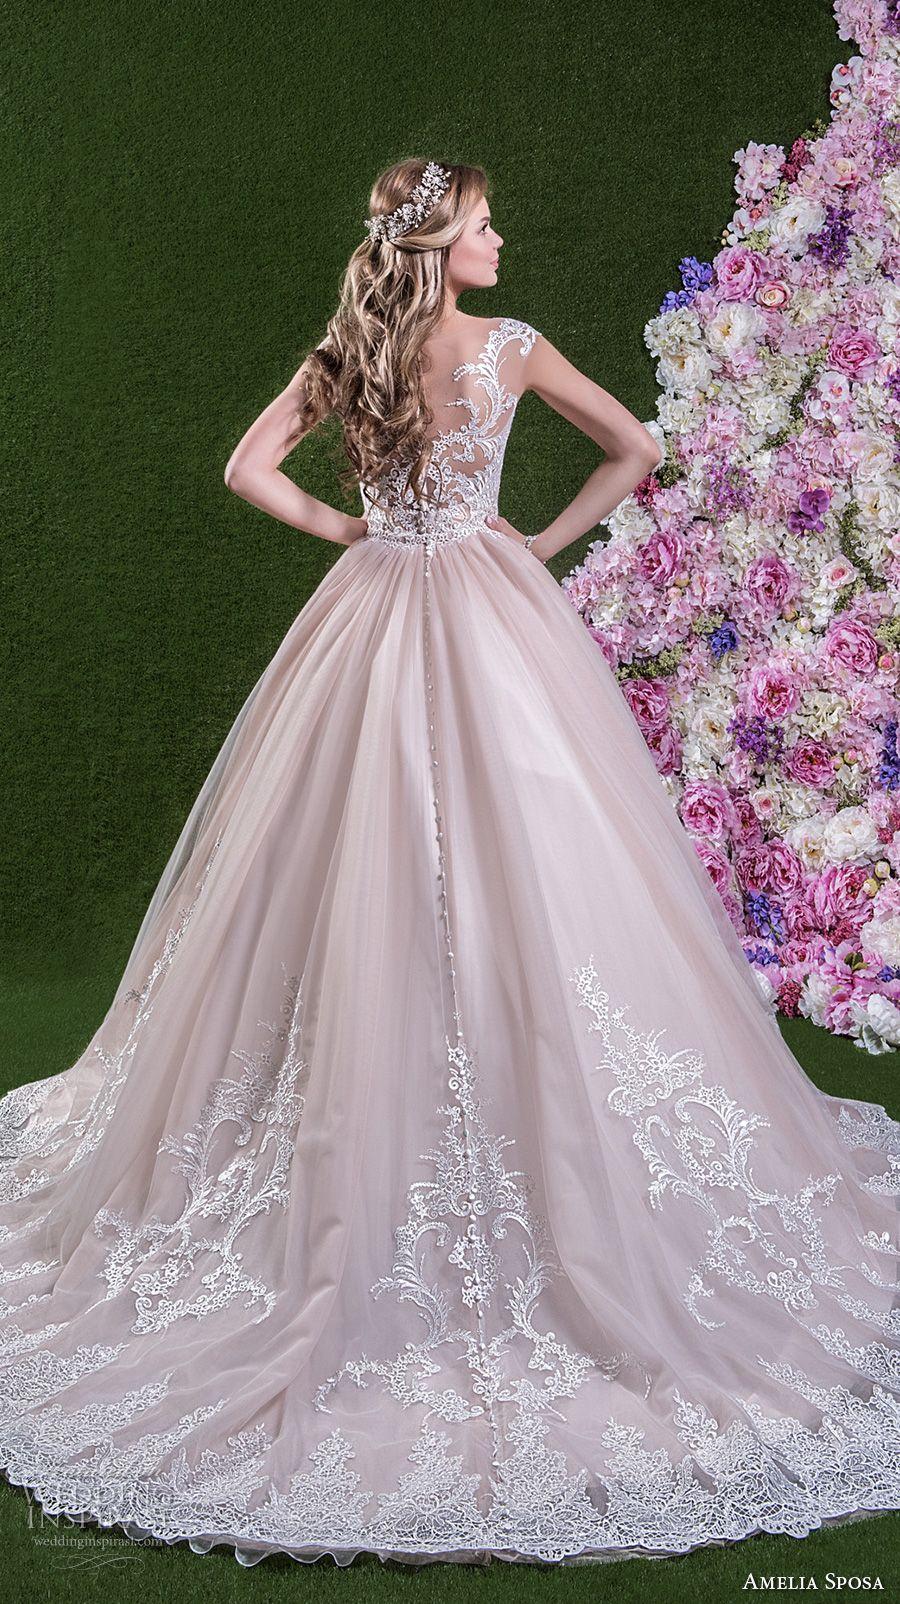 Amelia Sposa 2018 Wedding Dresses Wedding Inspirasi Amelia Sposa Wedding Dress Alternative Wedding Dresses Ball Gown Wedding Dress [ 1604 x 900 Pixel ]